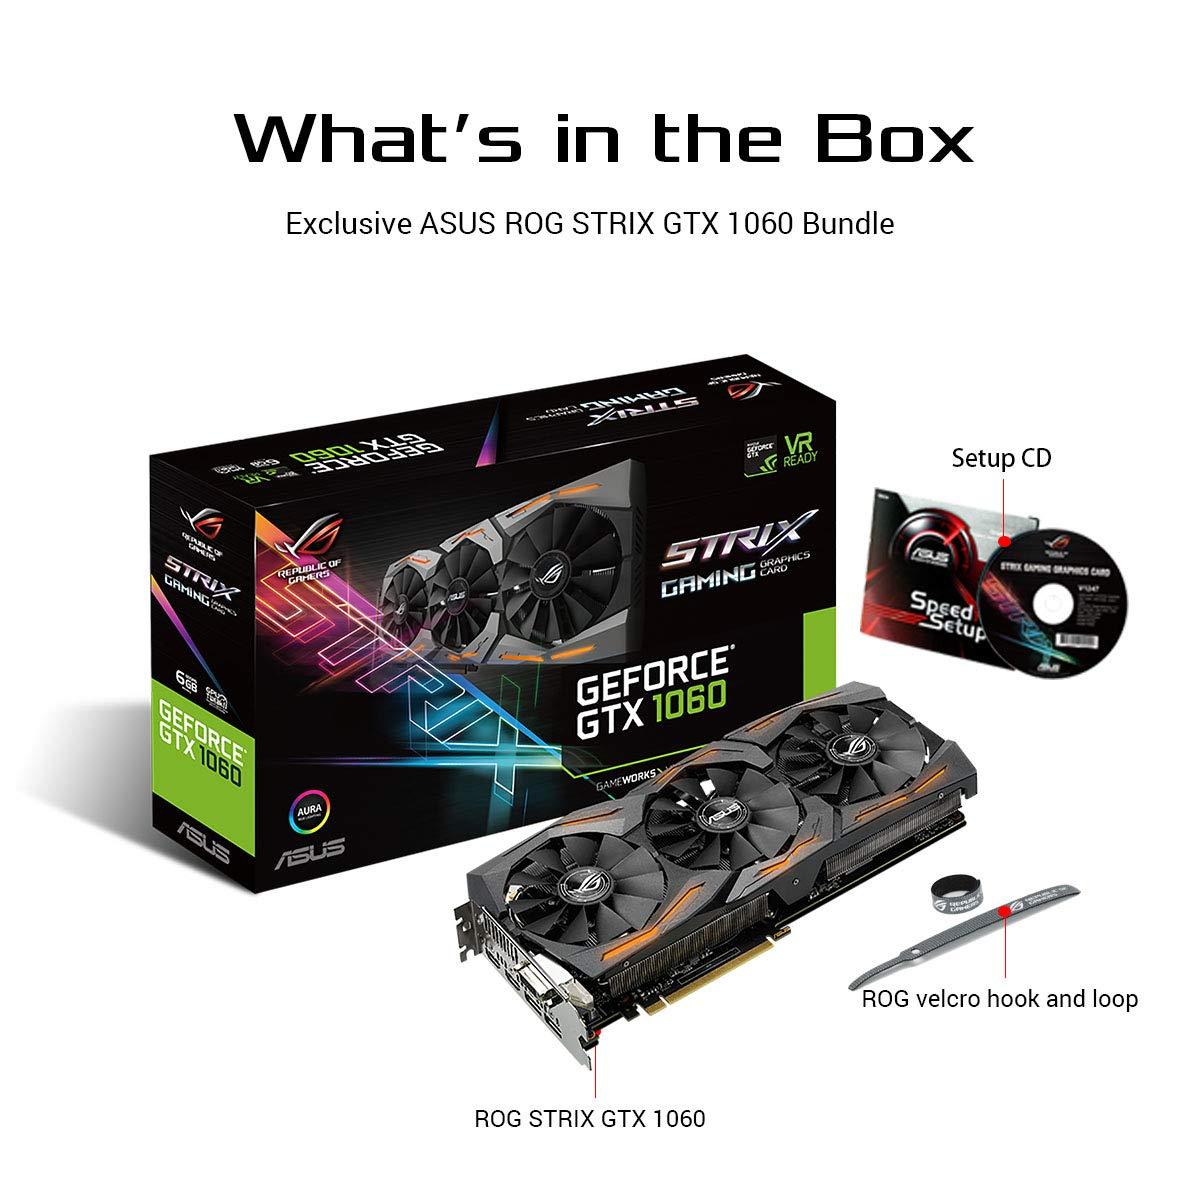 Asustek computer - Asus strix-gtx1060-6g-gaming, 6gb dvi, 2xhdmi, 2xdisplayport: Amazon.es: Informática